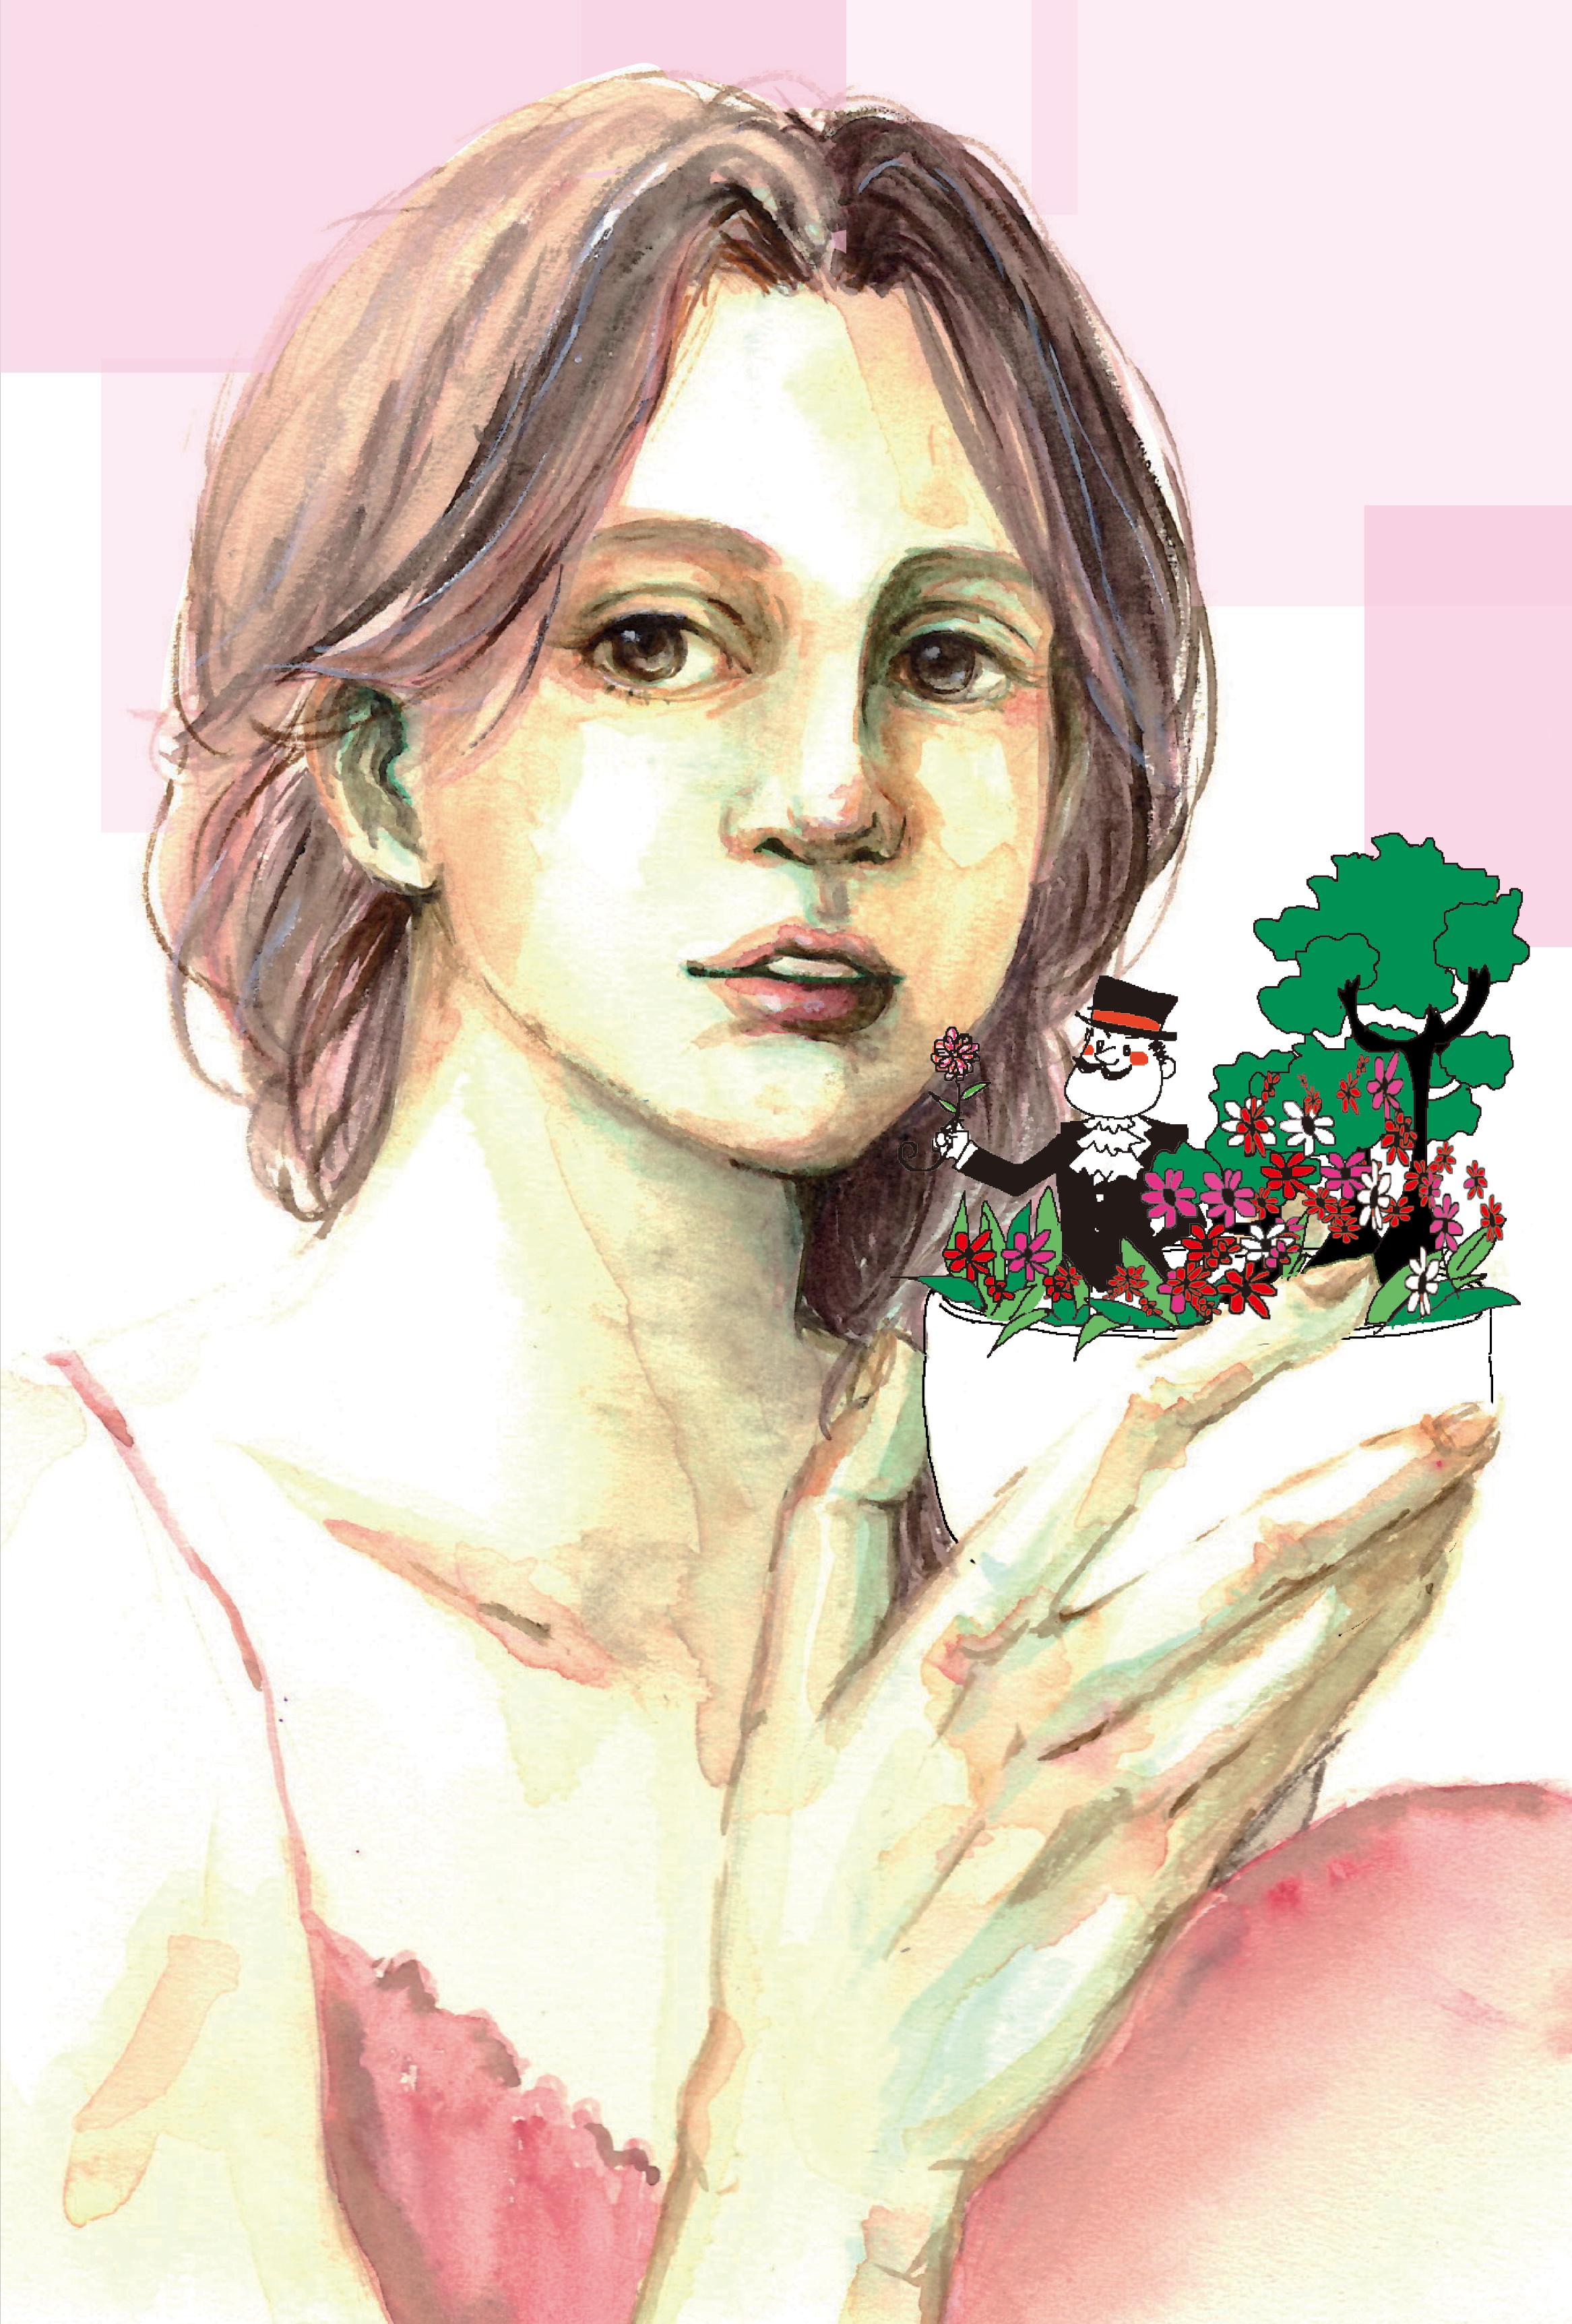 With Garden